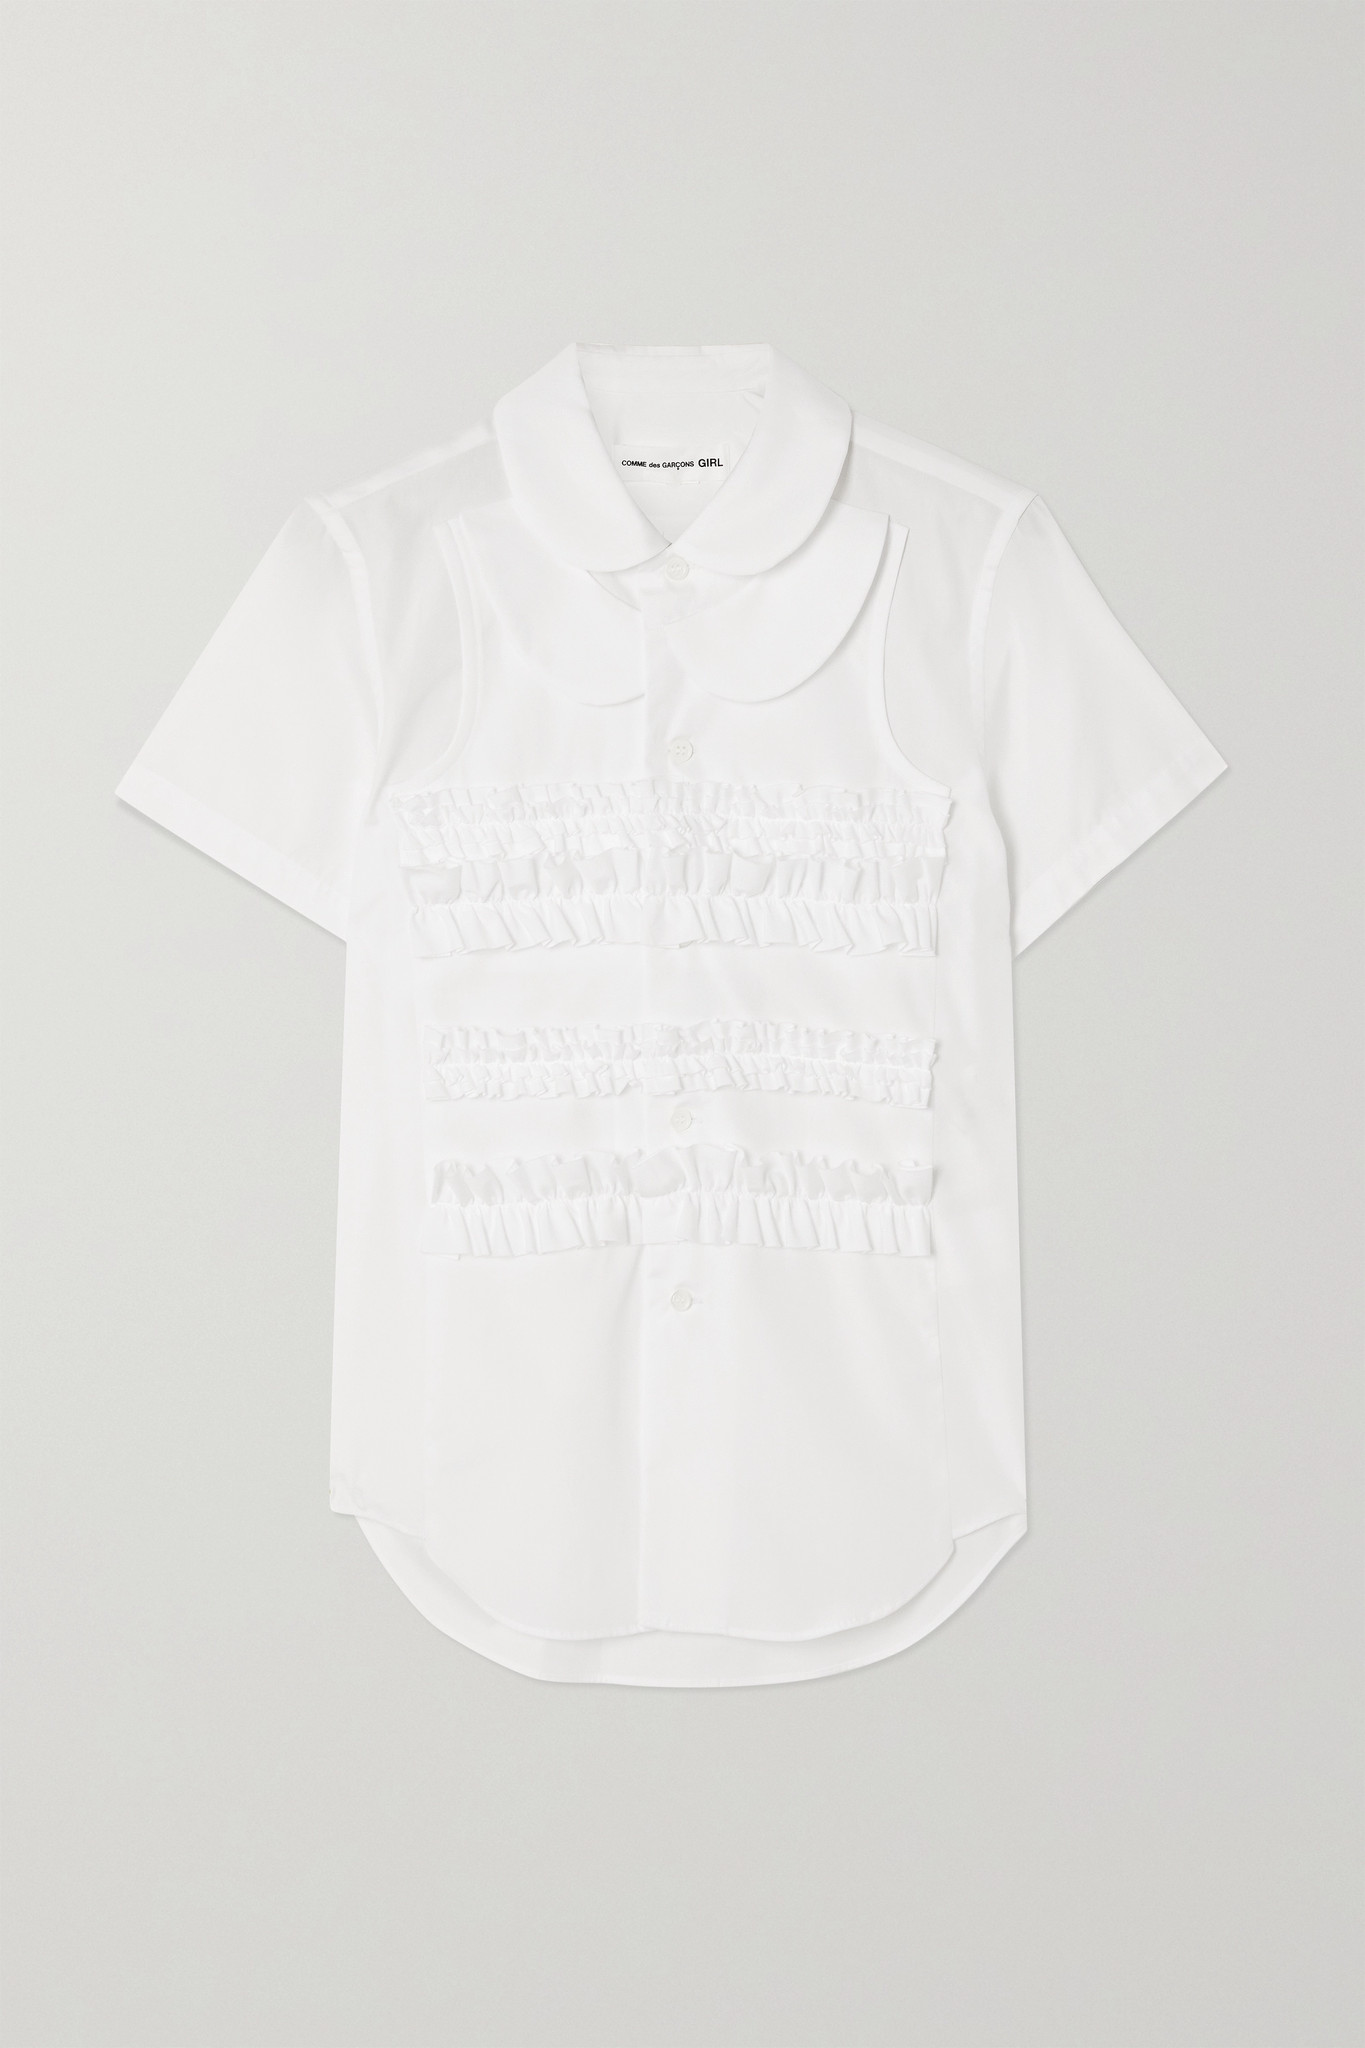 COMME DES GARÇONS GIRL - Ruffled Cotton-poplin Blouse - White - small